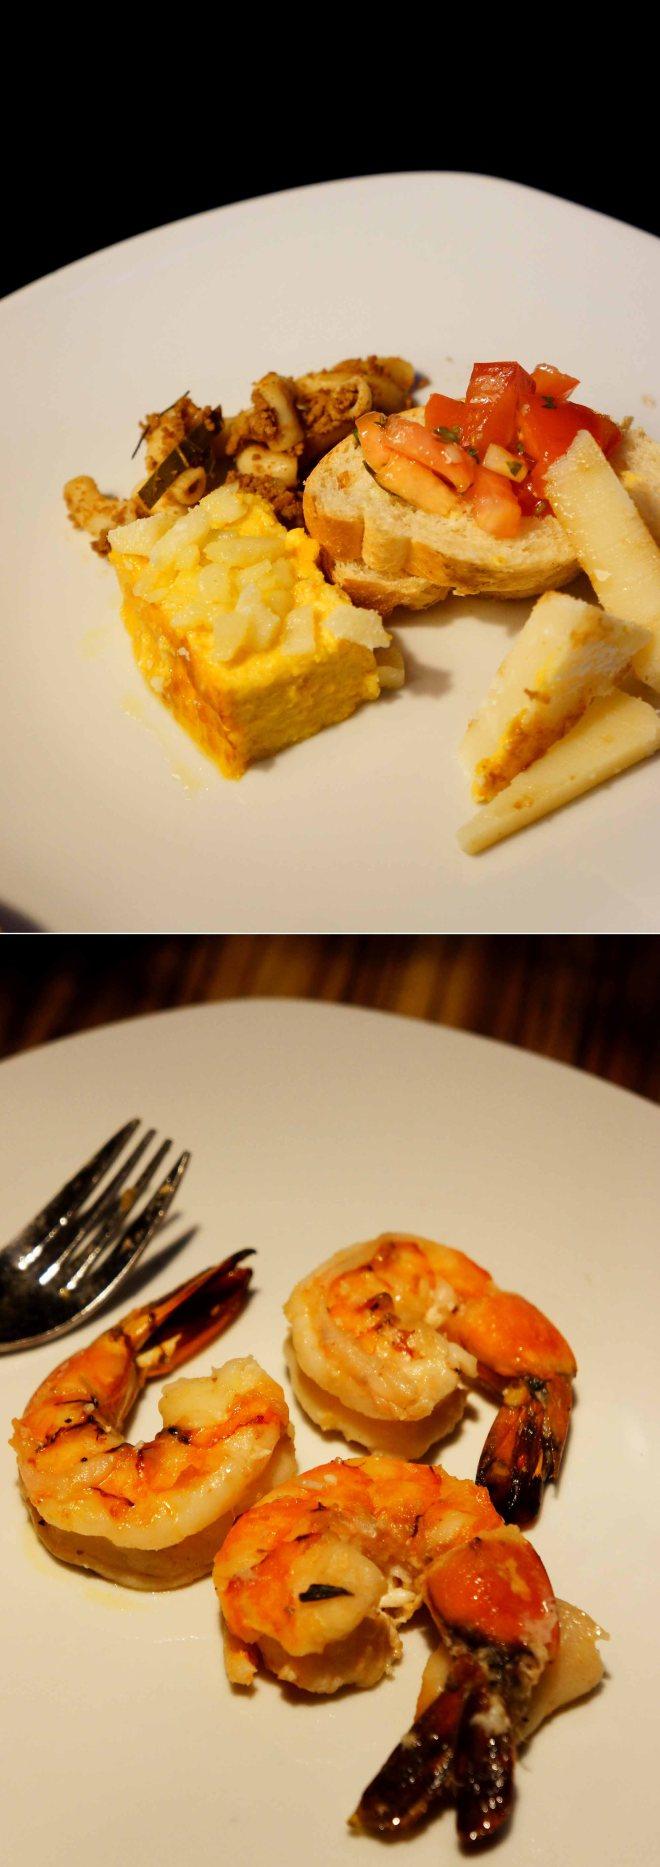 Apericena-Foods4